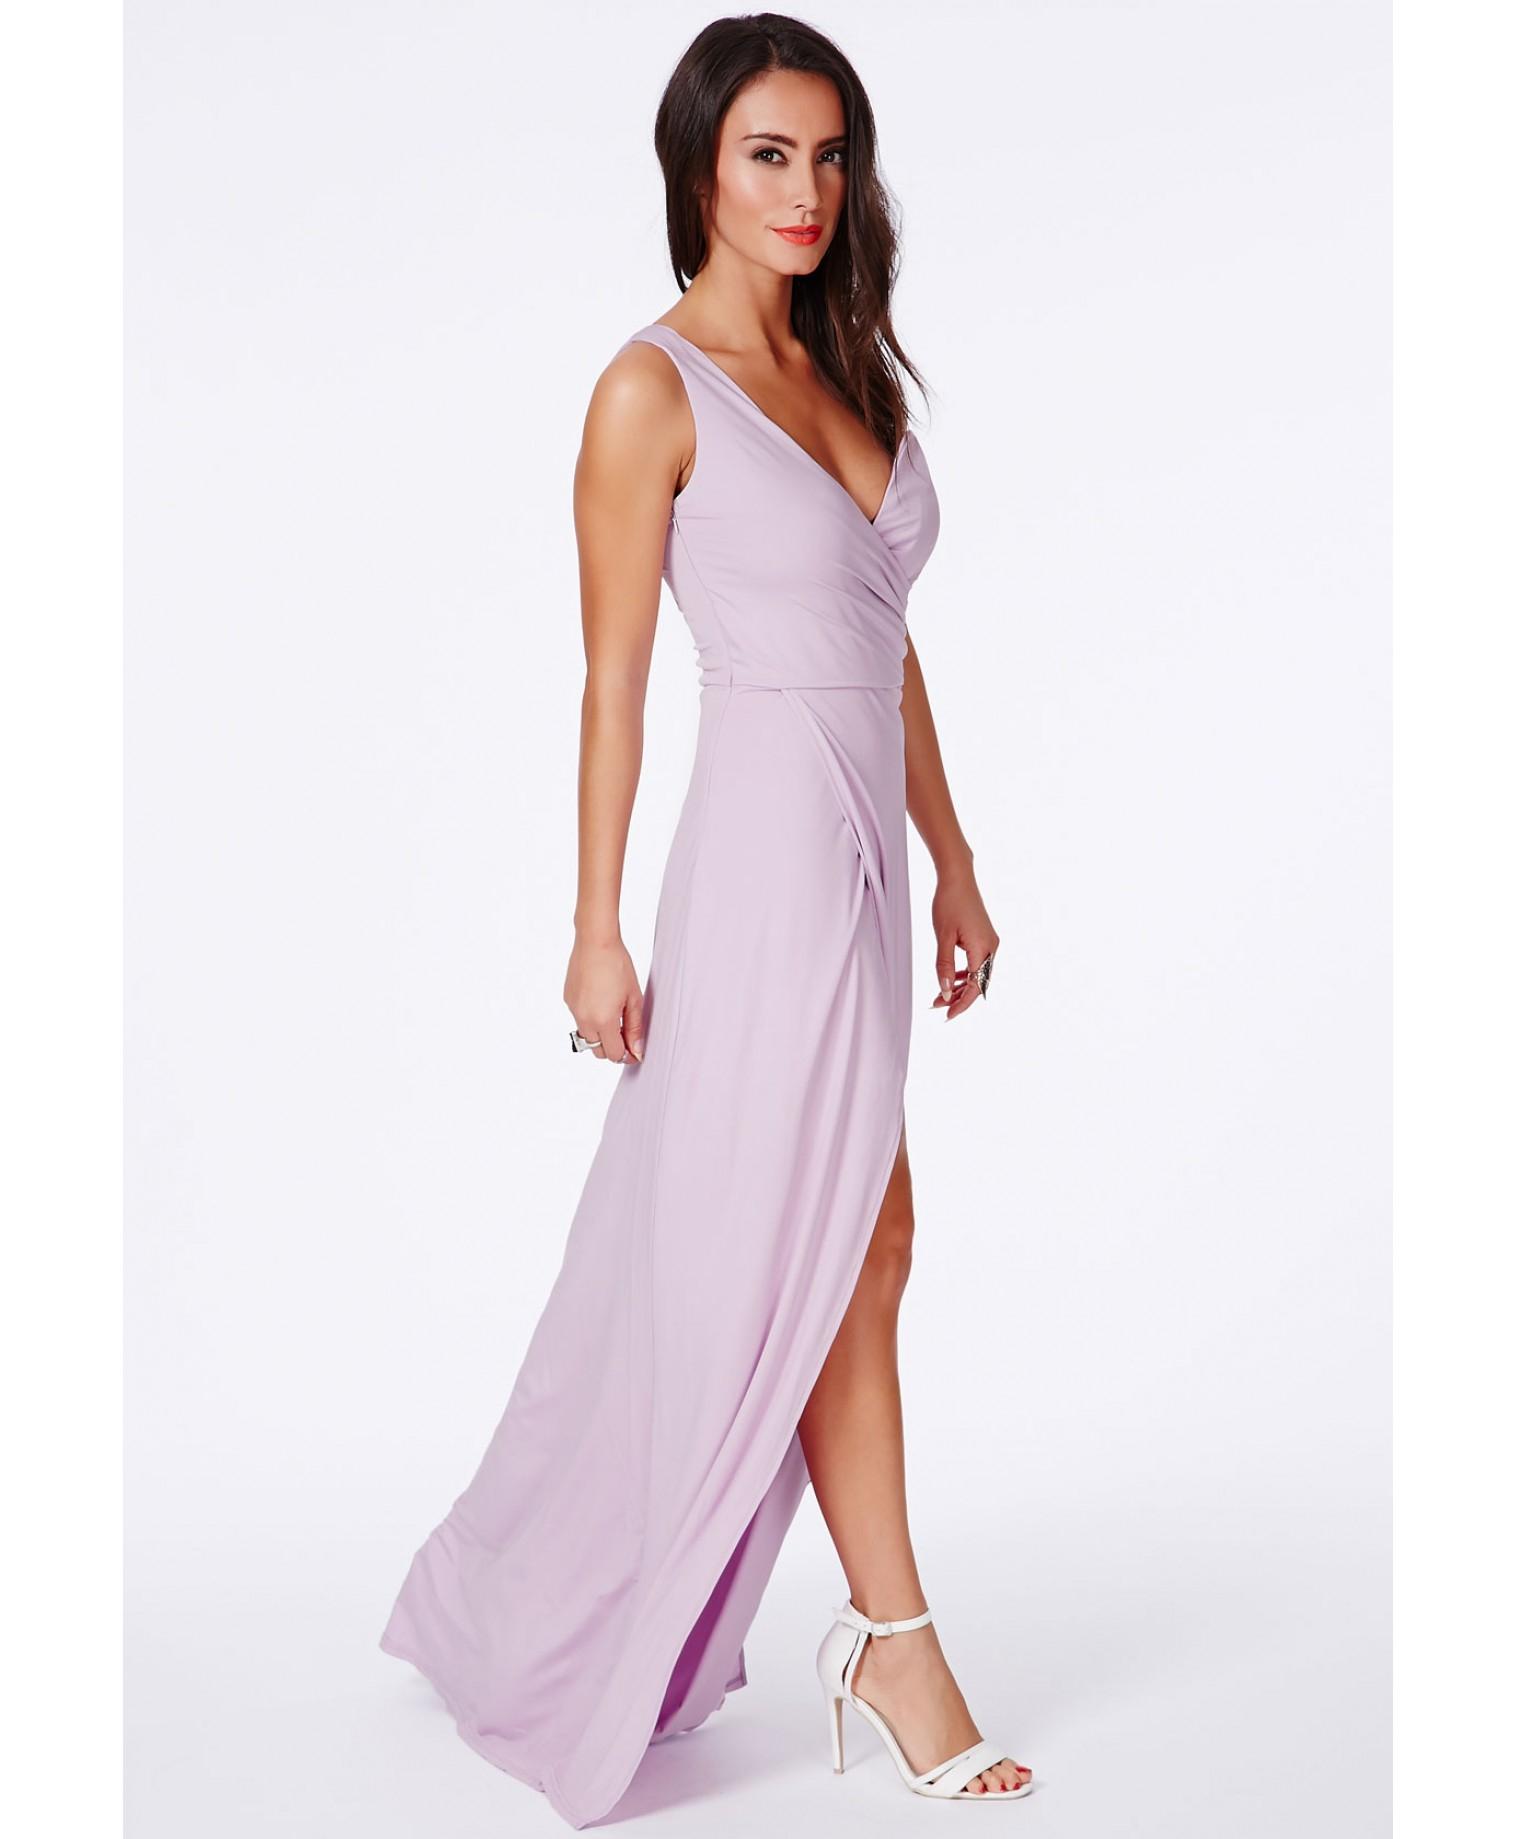 Missguided Koemi Lilac One Shoulder Bustier Split Maxi Dress in ...